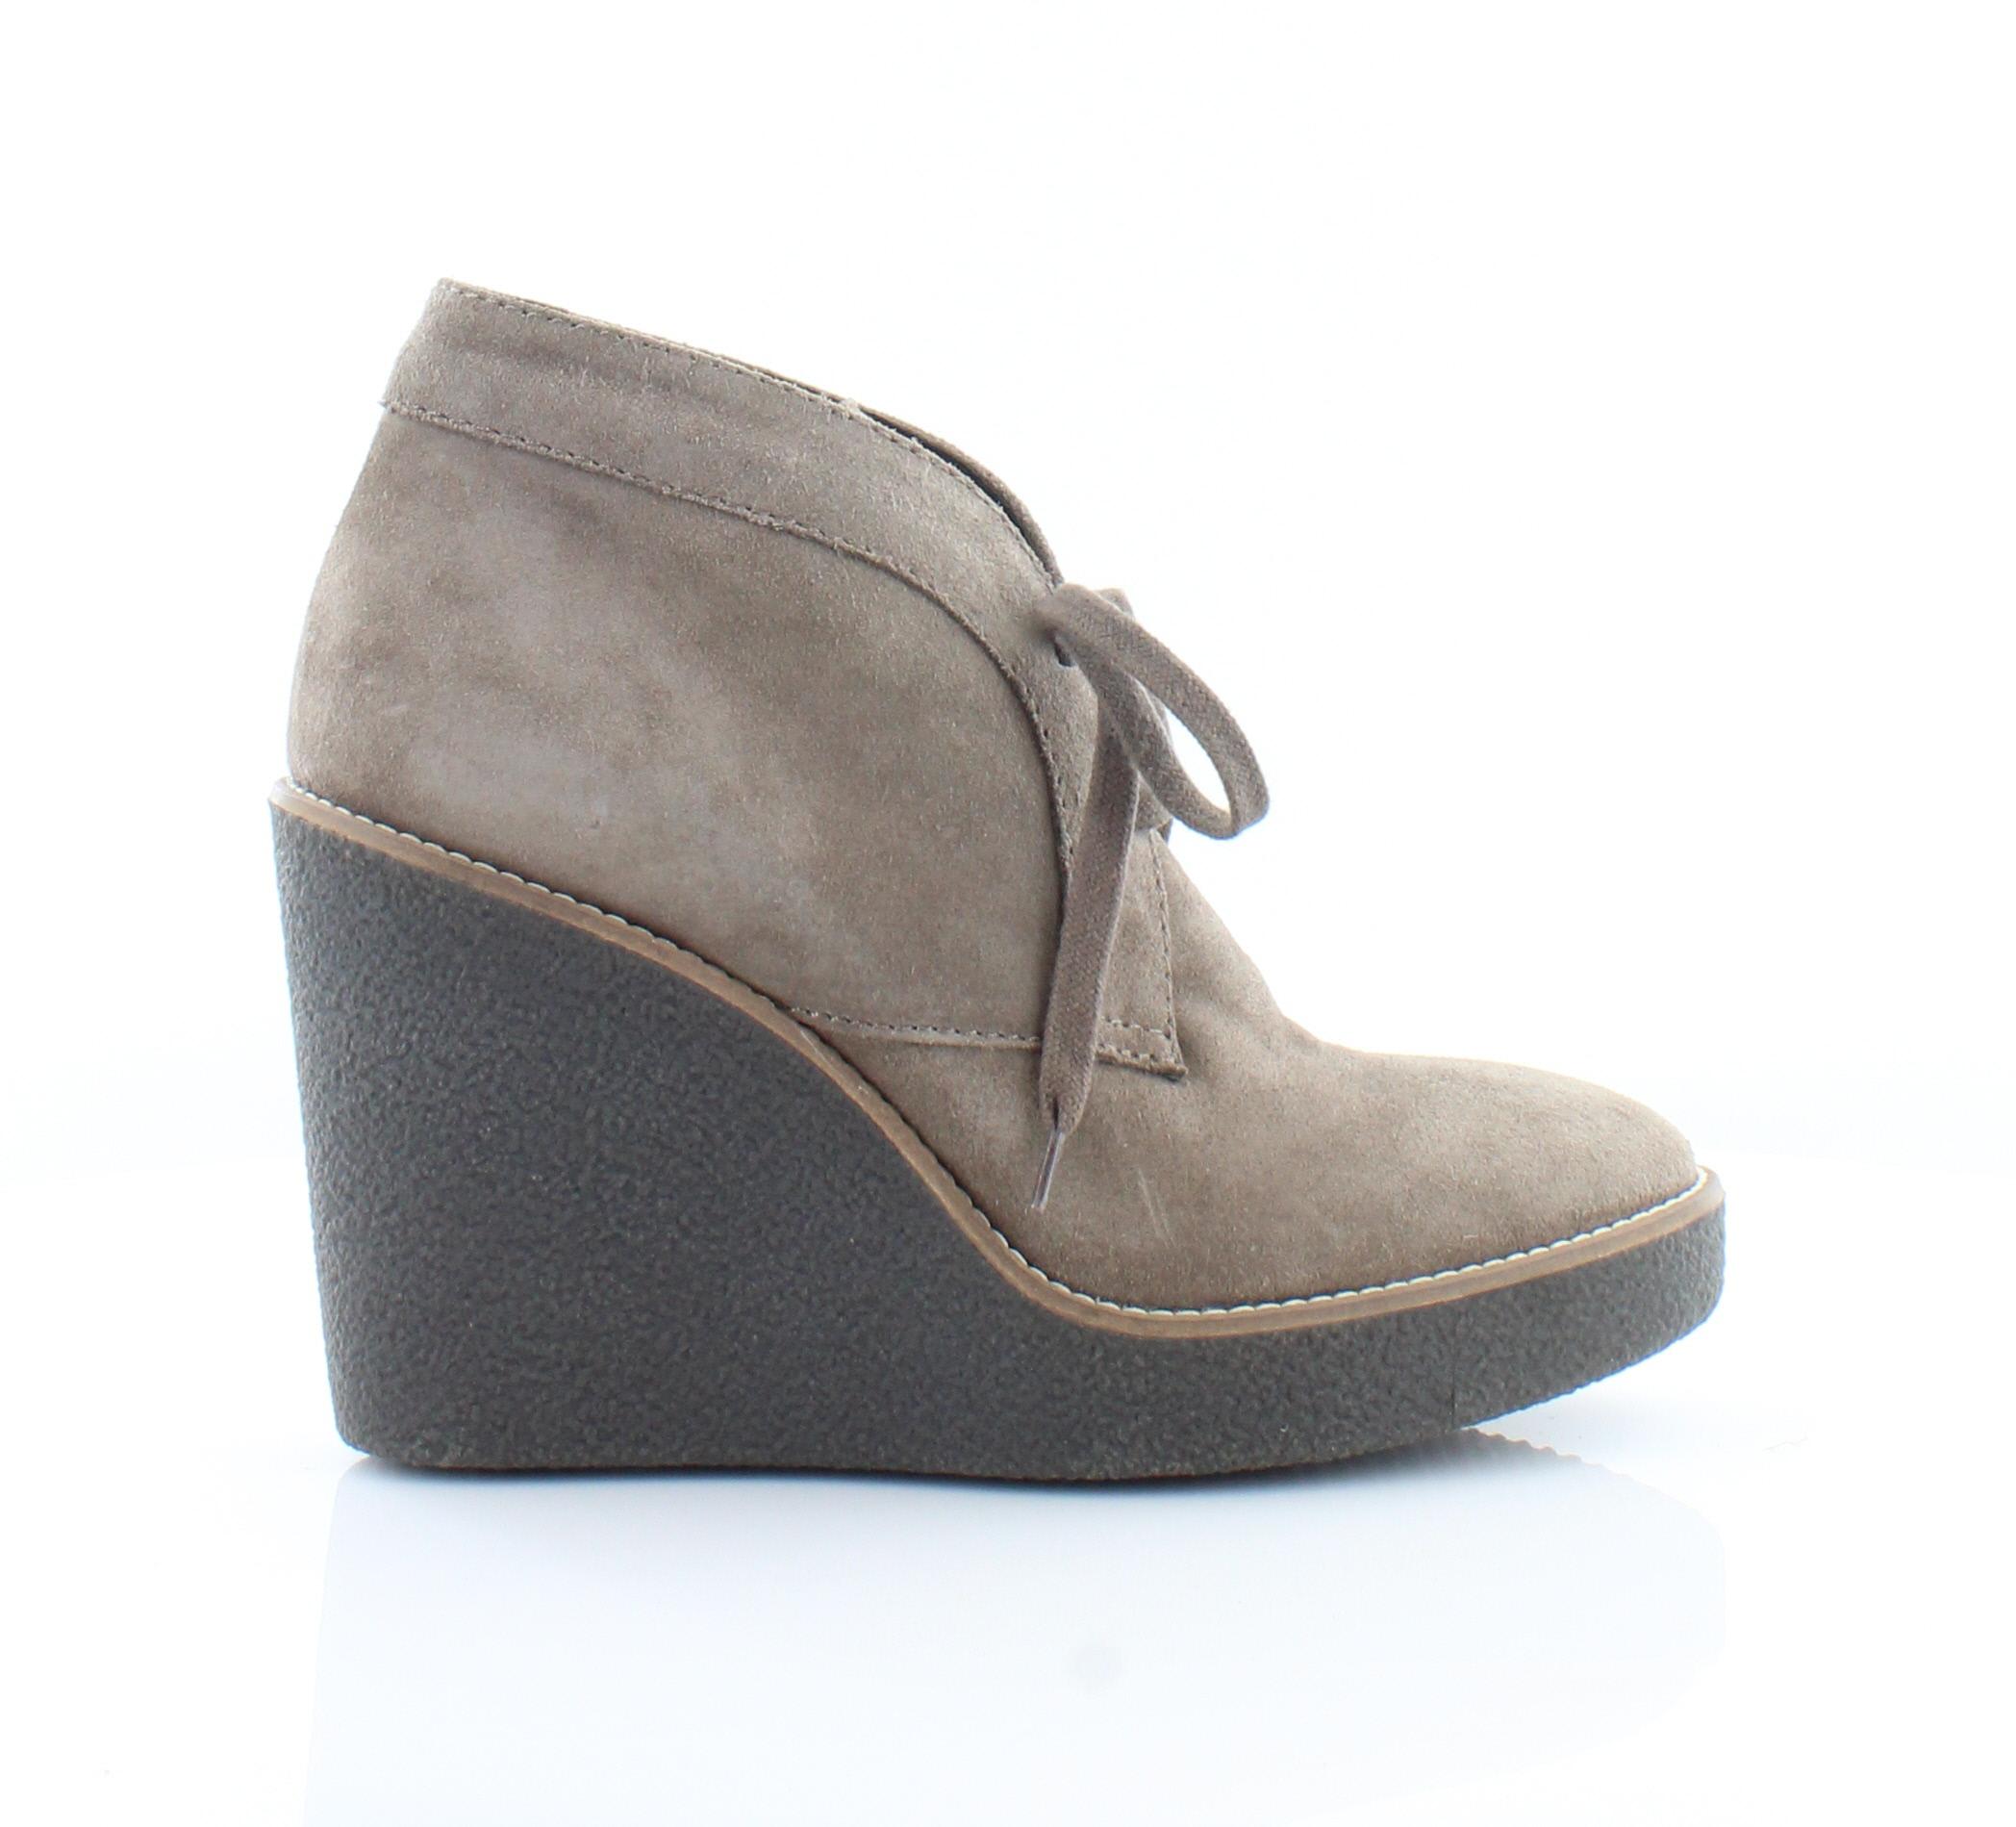 1e72df07bd2f Aquatalia-Vianna-Women-039-s-Boots-Taupe thumbnail 8